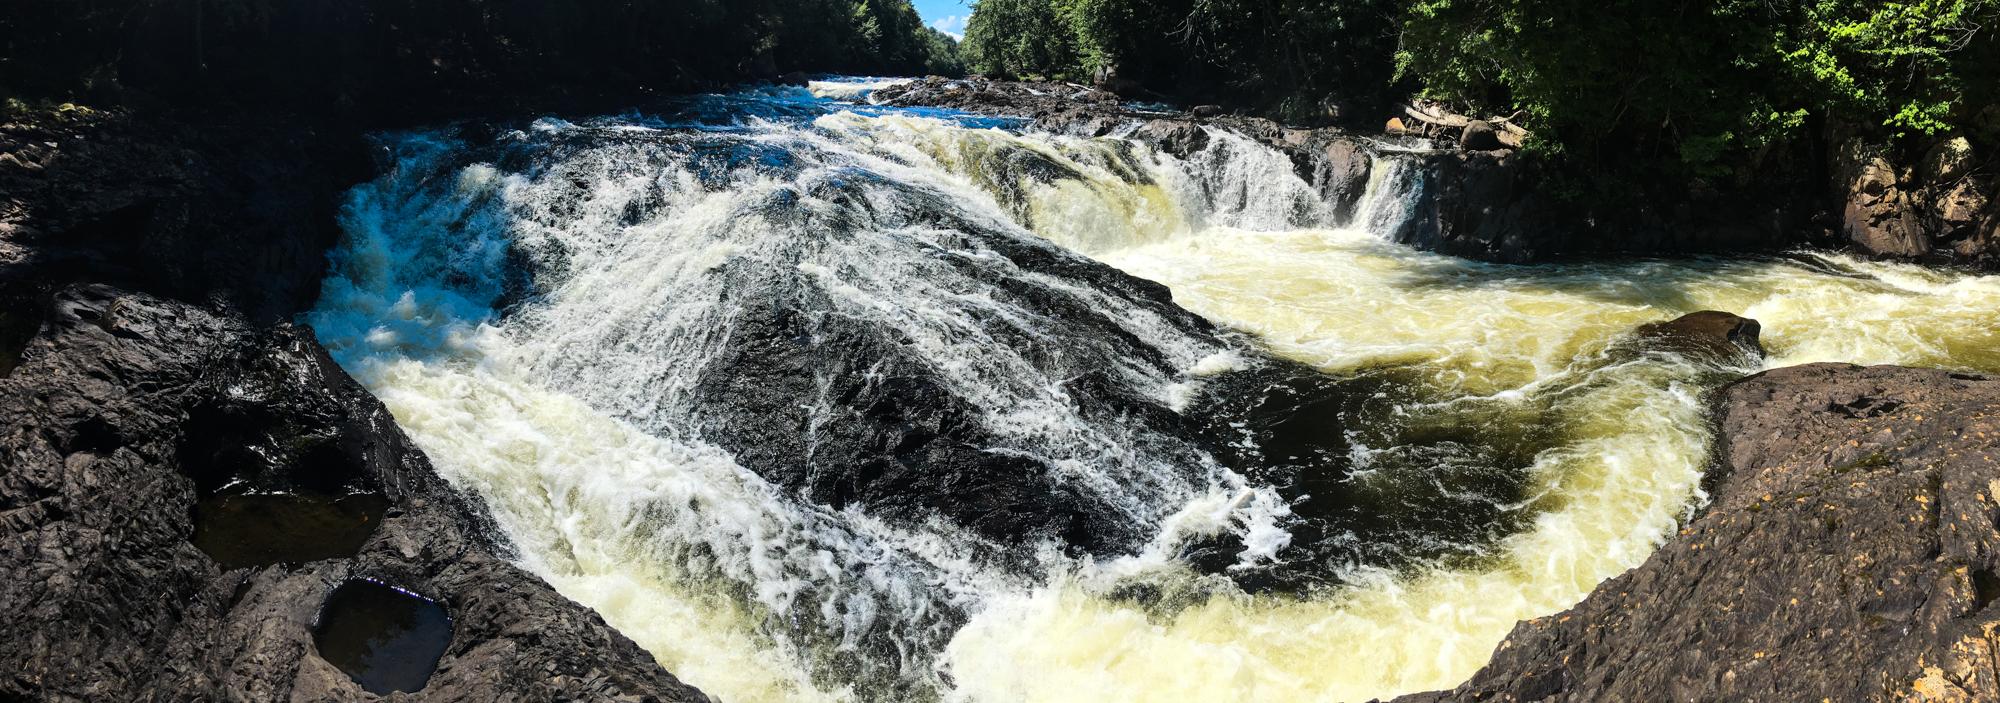 Lower Falls on the Raquette River